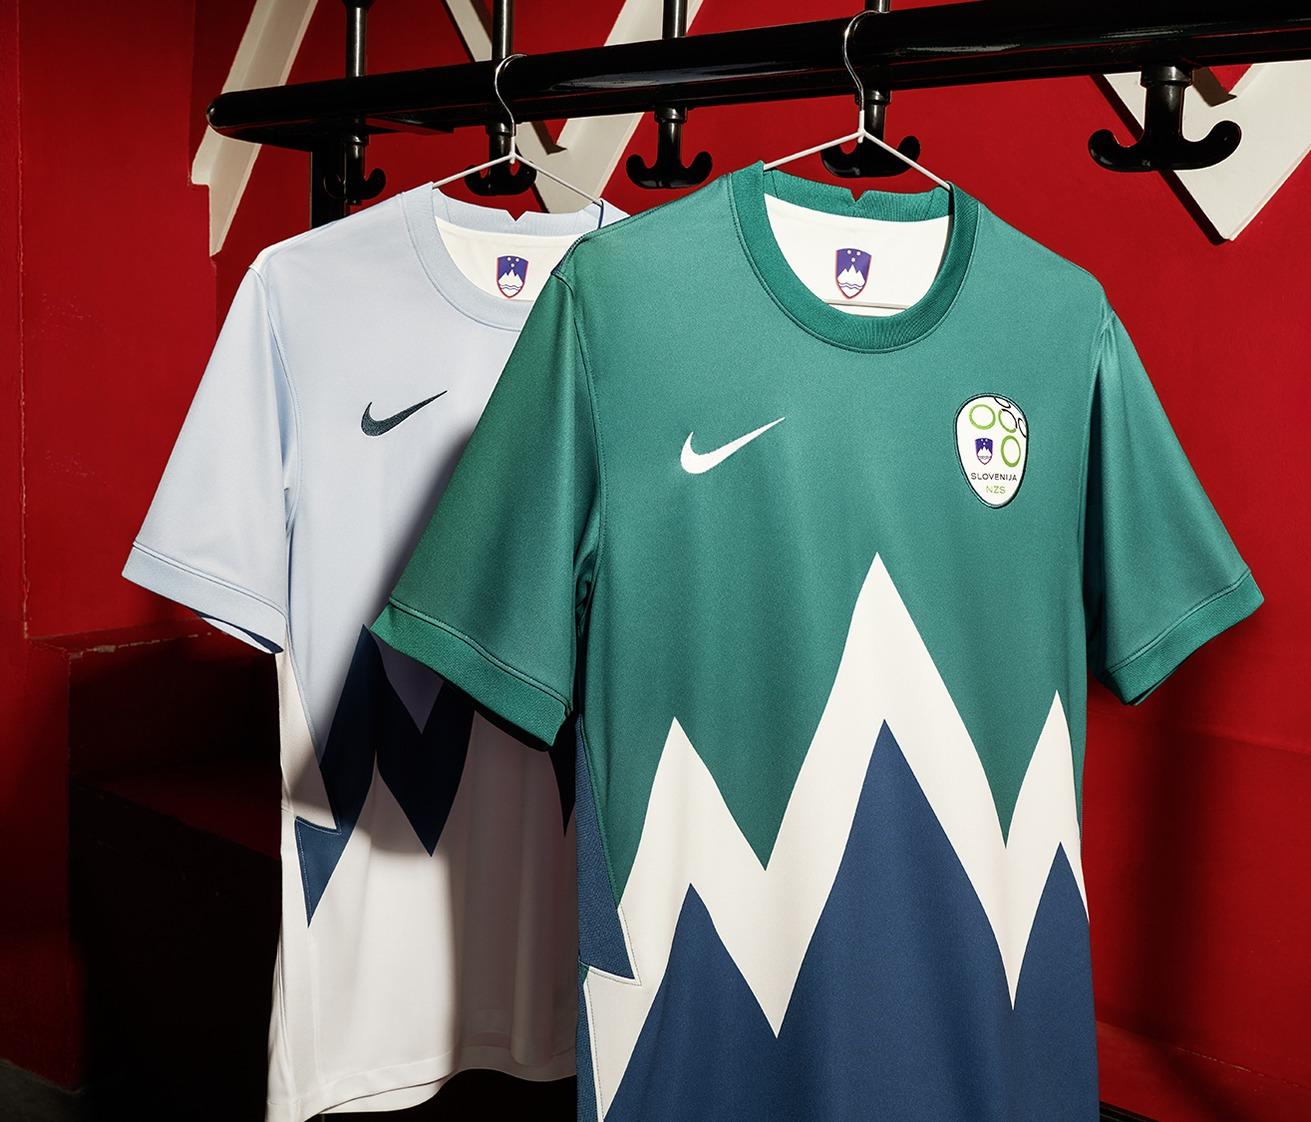 Camisetas Nike de Eslovenia 2020/21 | Imagen NSZ